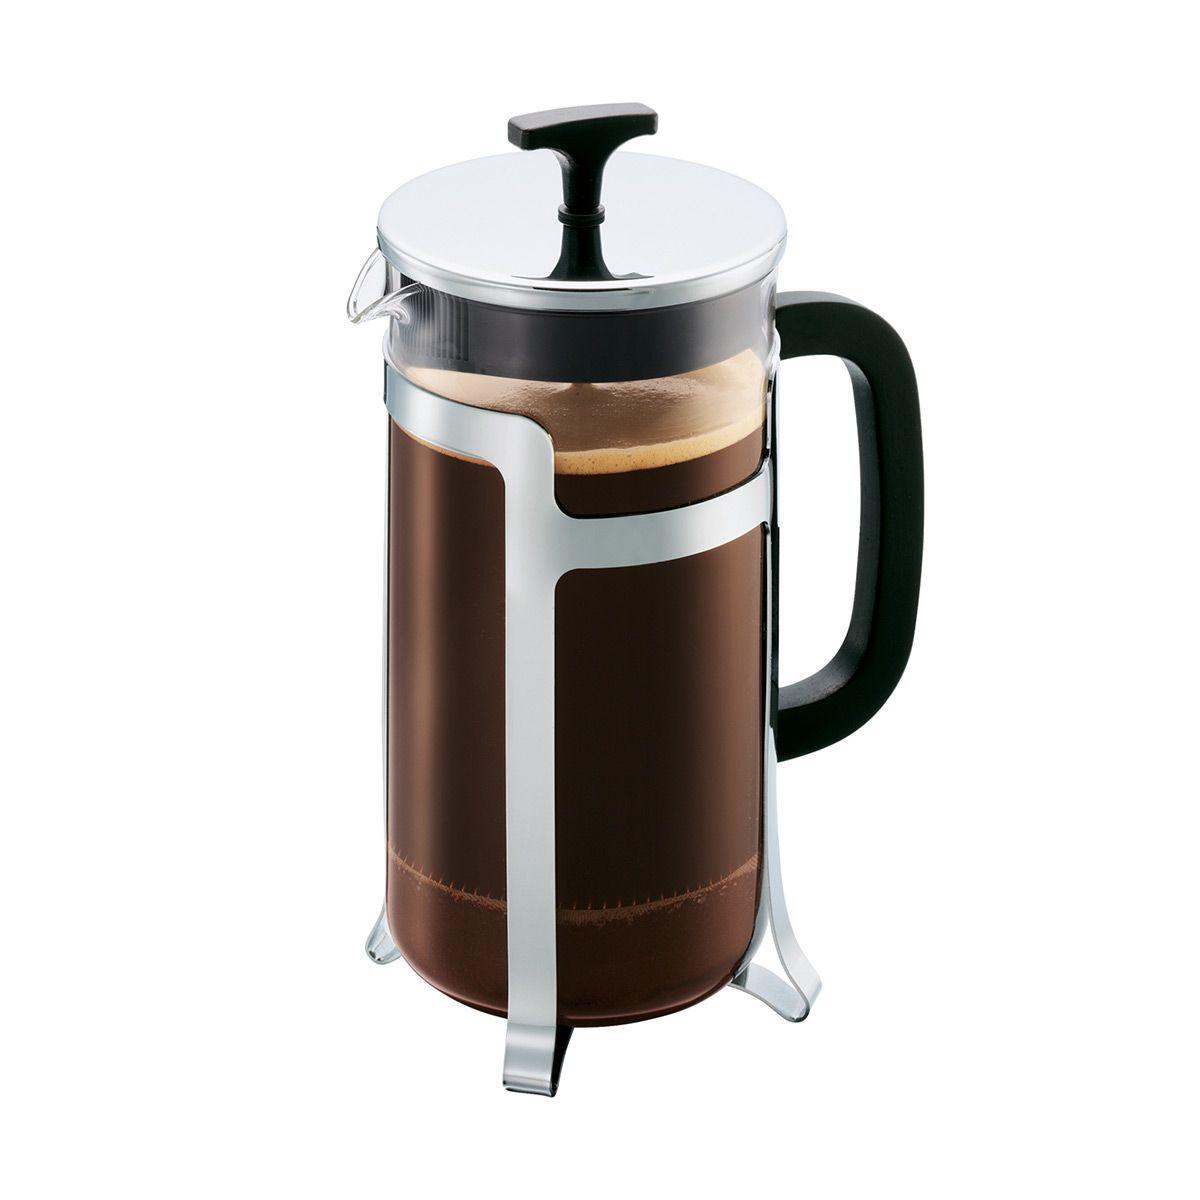 French Press Coffee Maker CHAMBORD Bodum